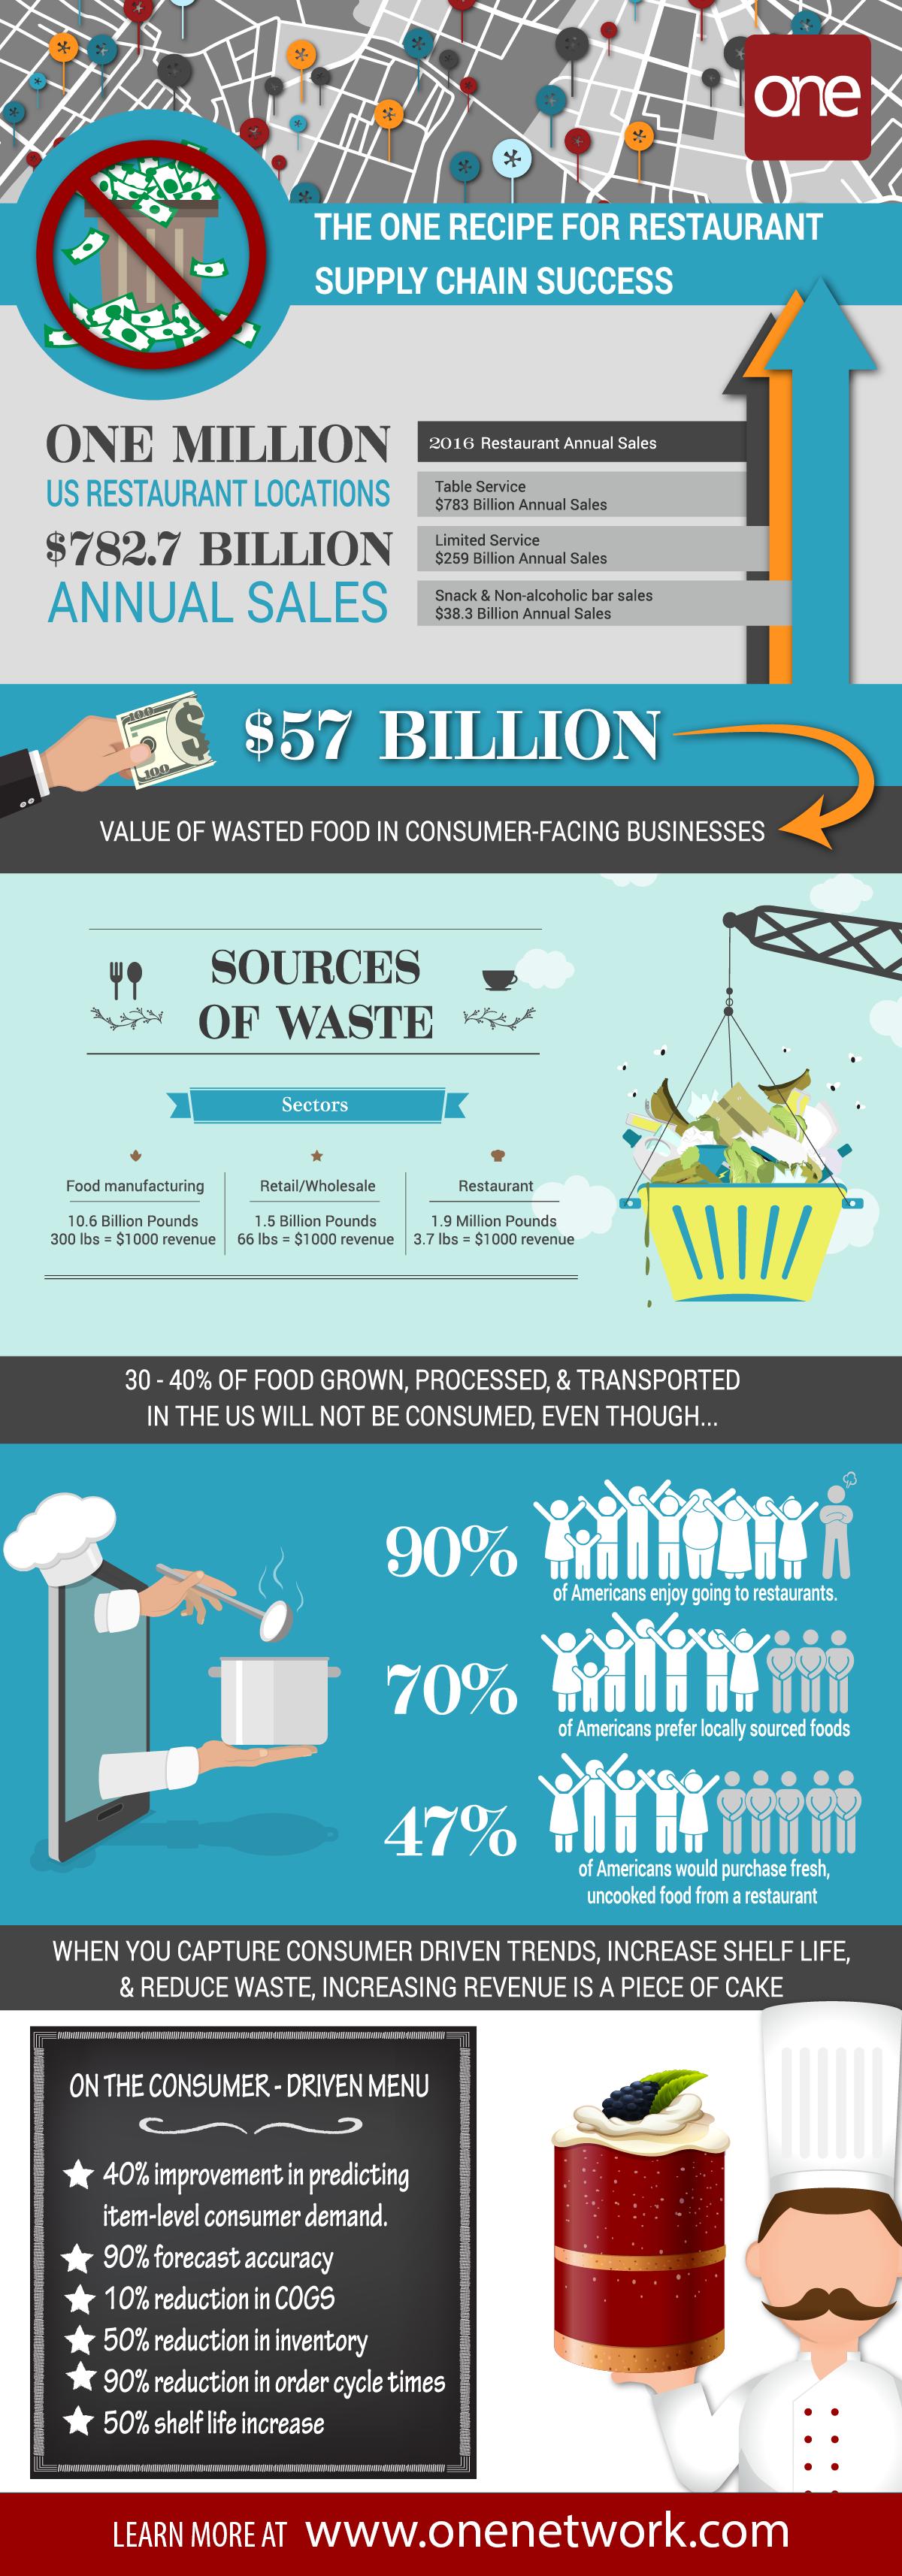 Restaurant Supply Chain's Digital Transformation